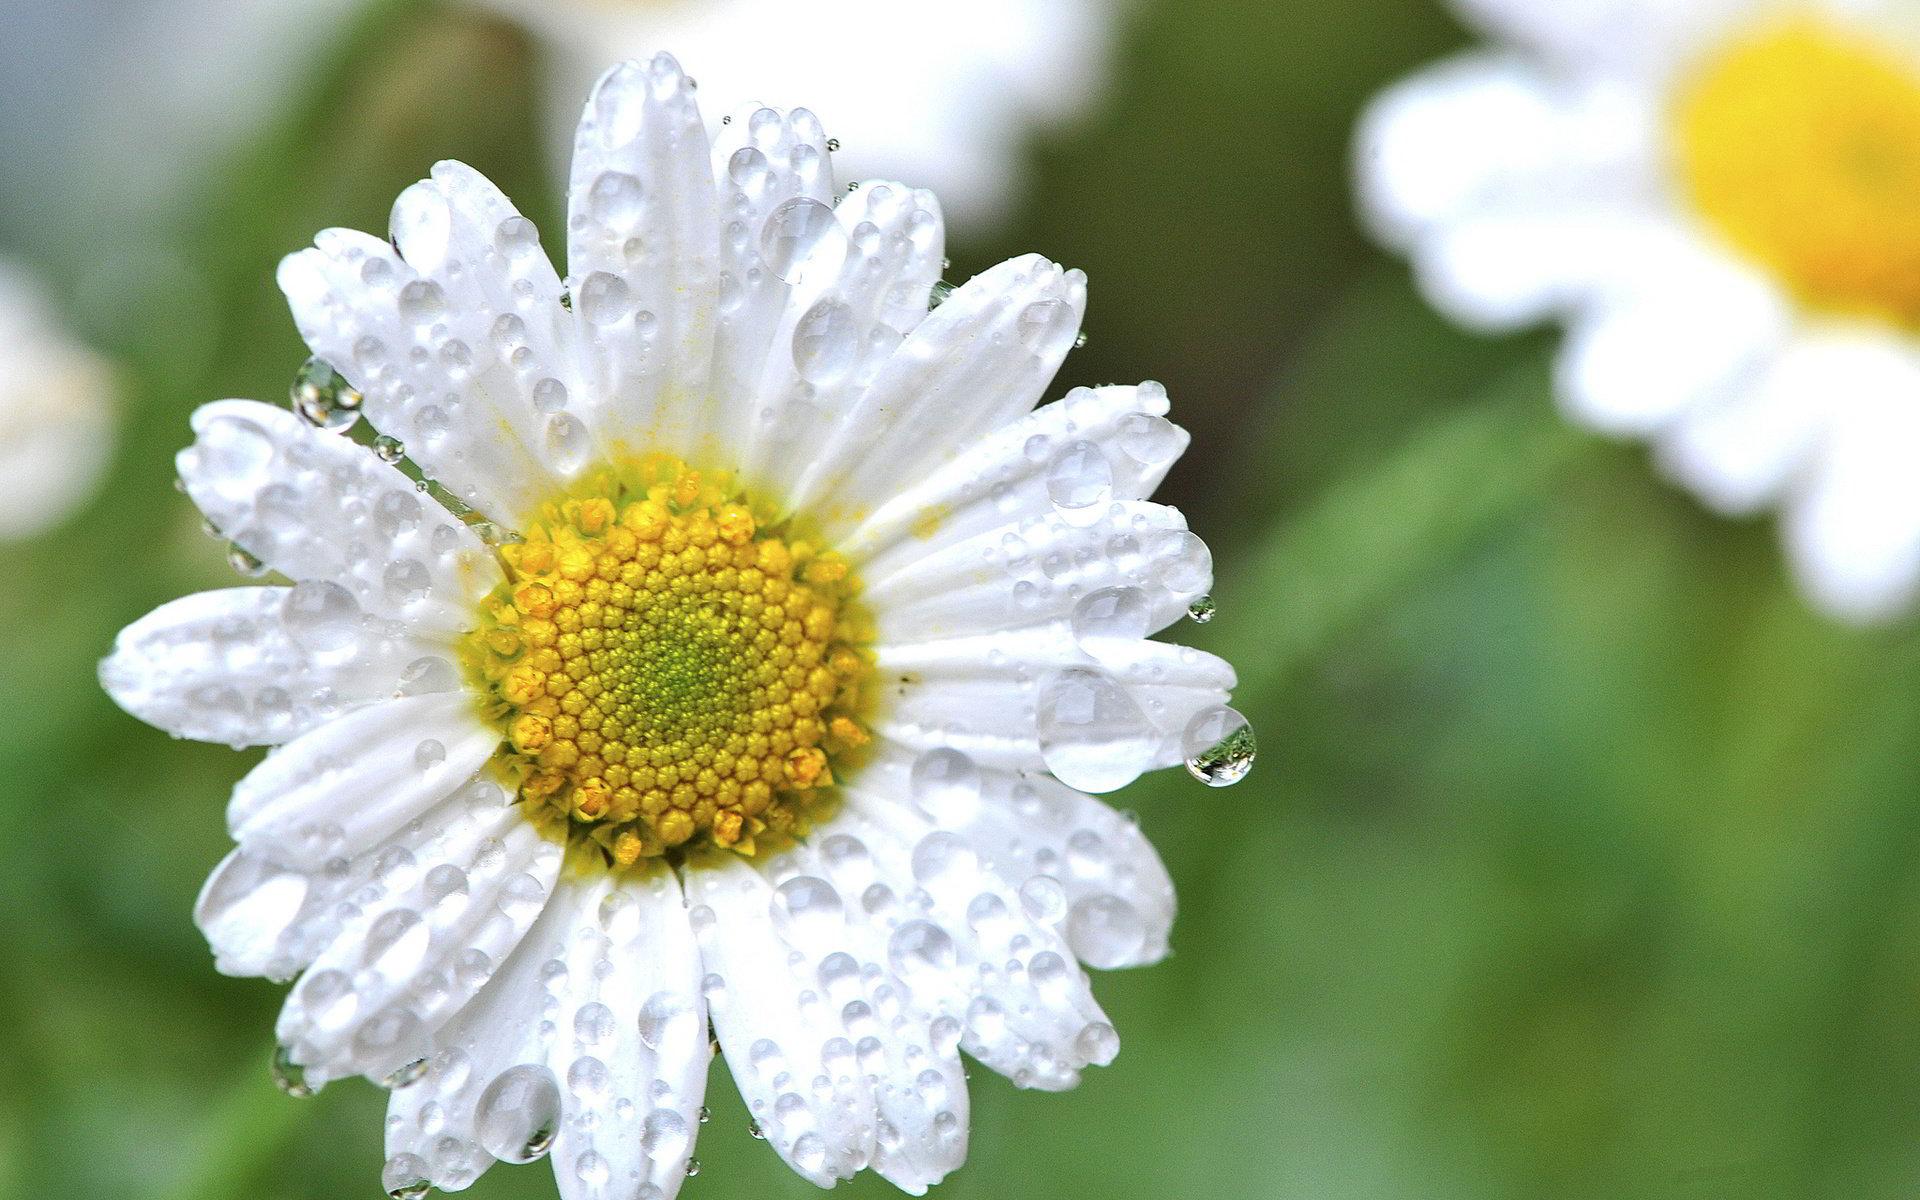 hinh anh hoa cuc dep 3